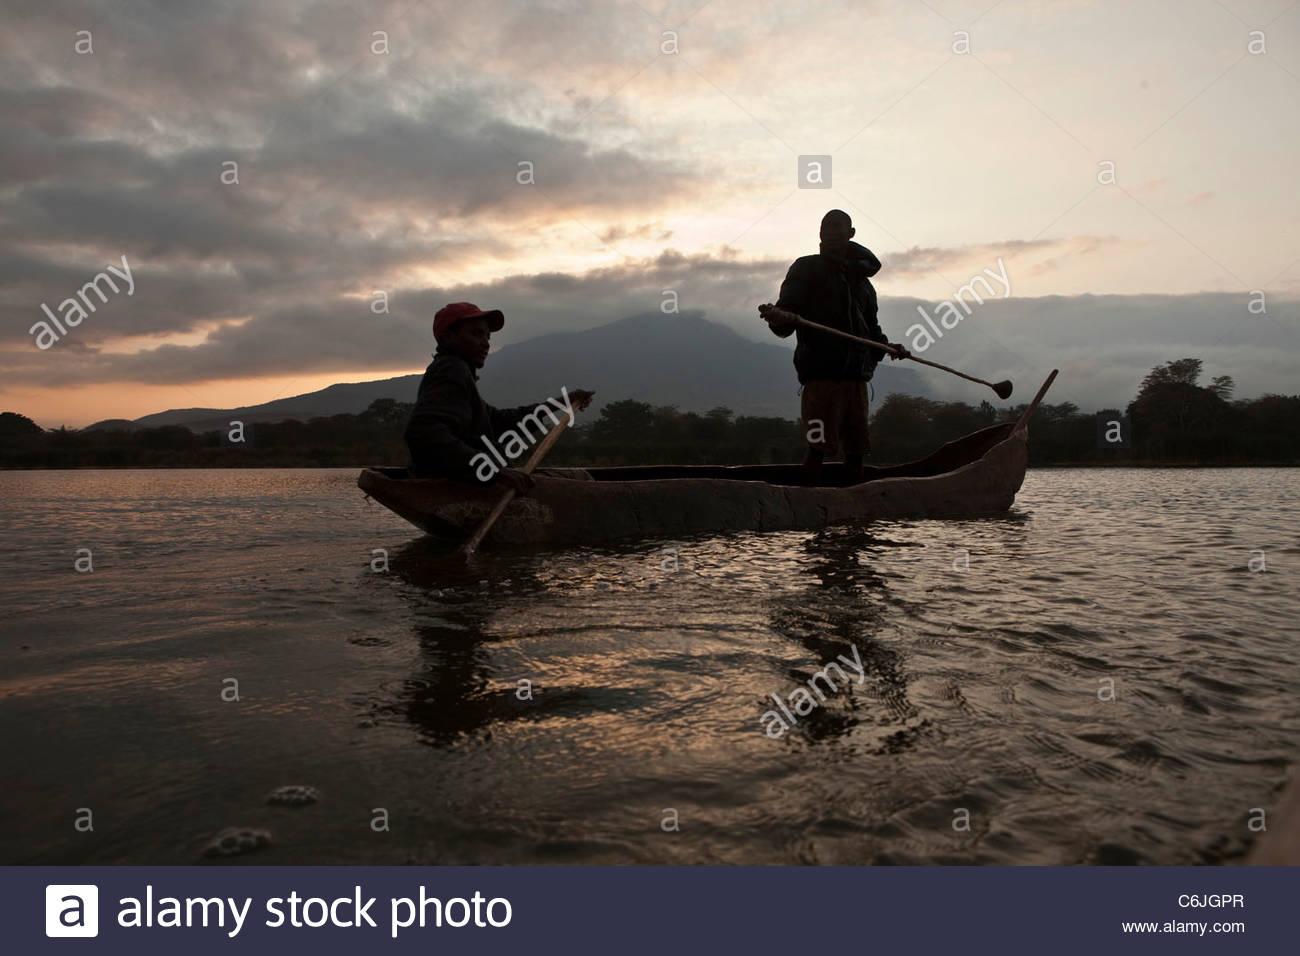 Two fishermen in a dugout canoe on Lake Babati at sunrise - Stock Image